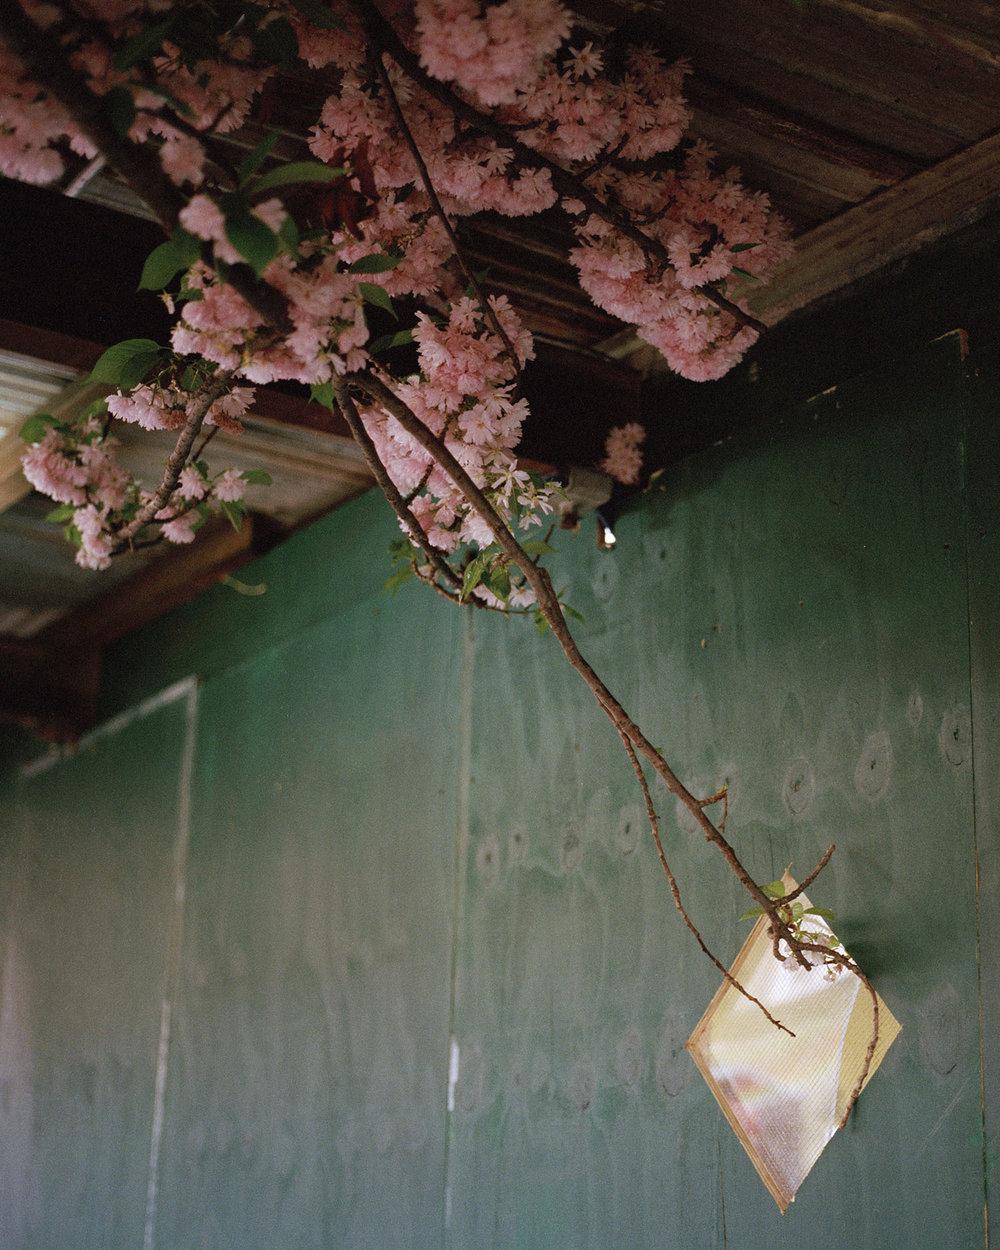 2017-05-11_Hass_Blossoms.jpg